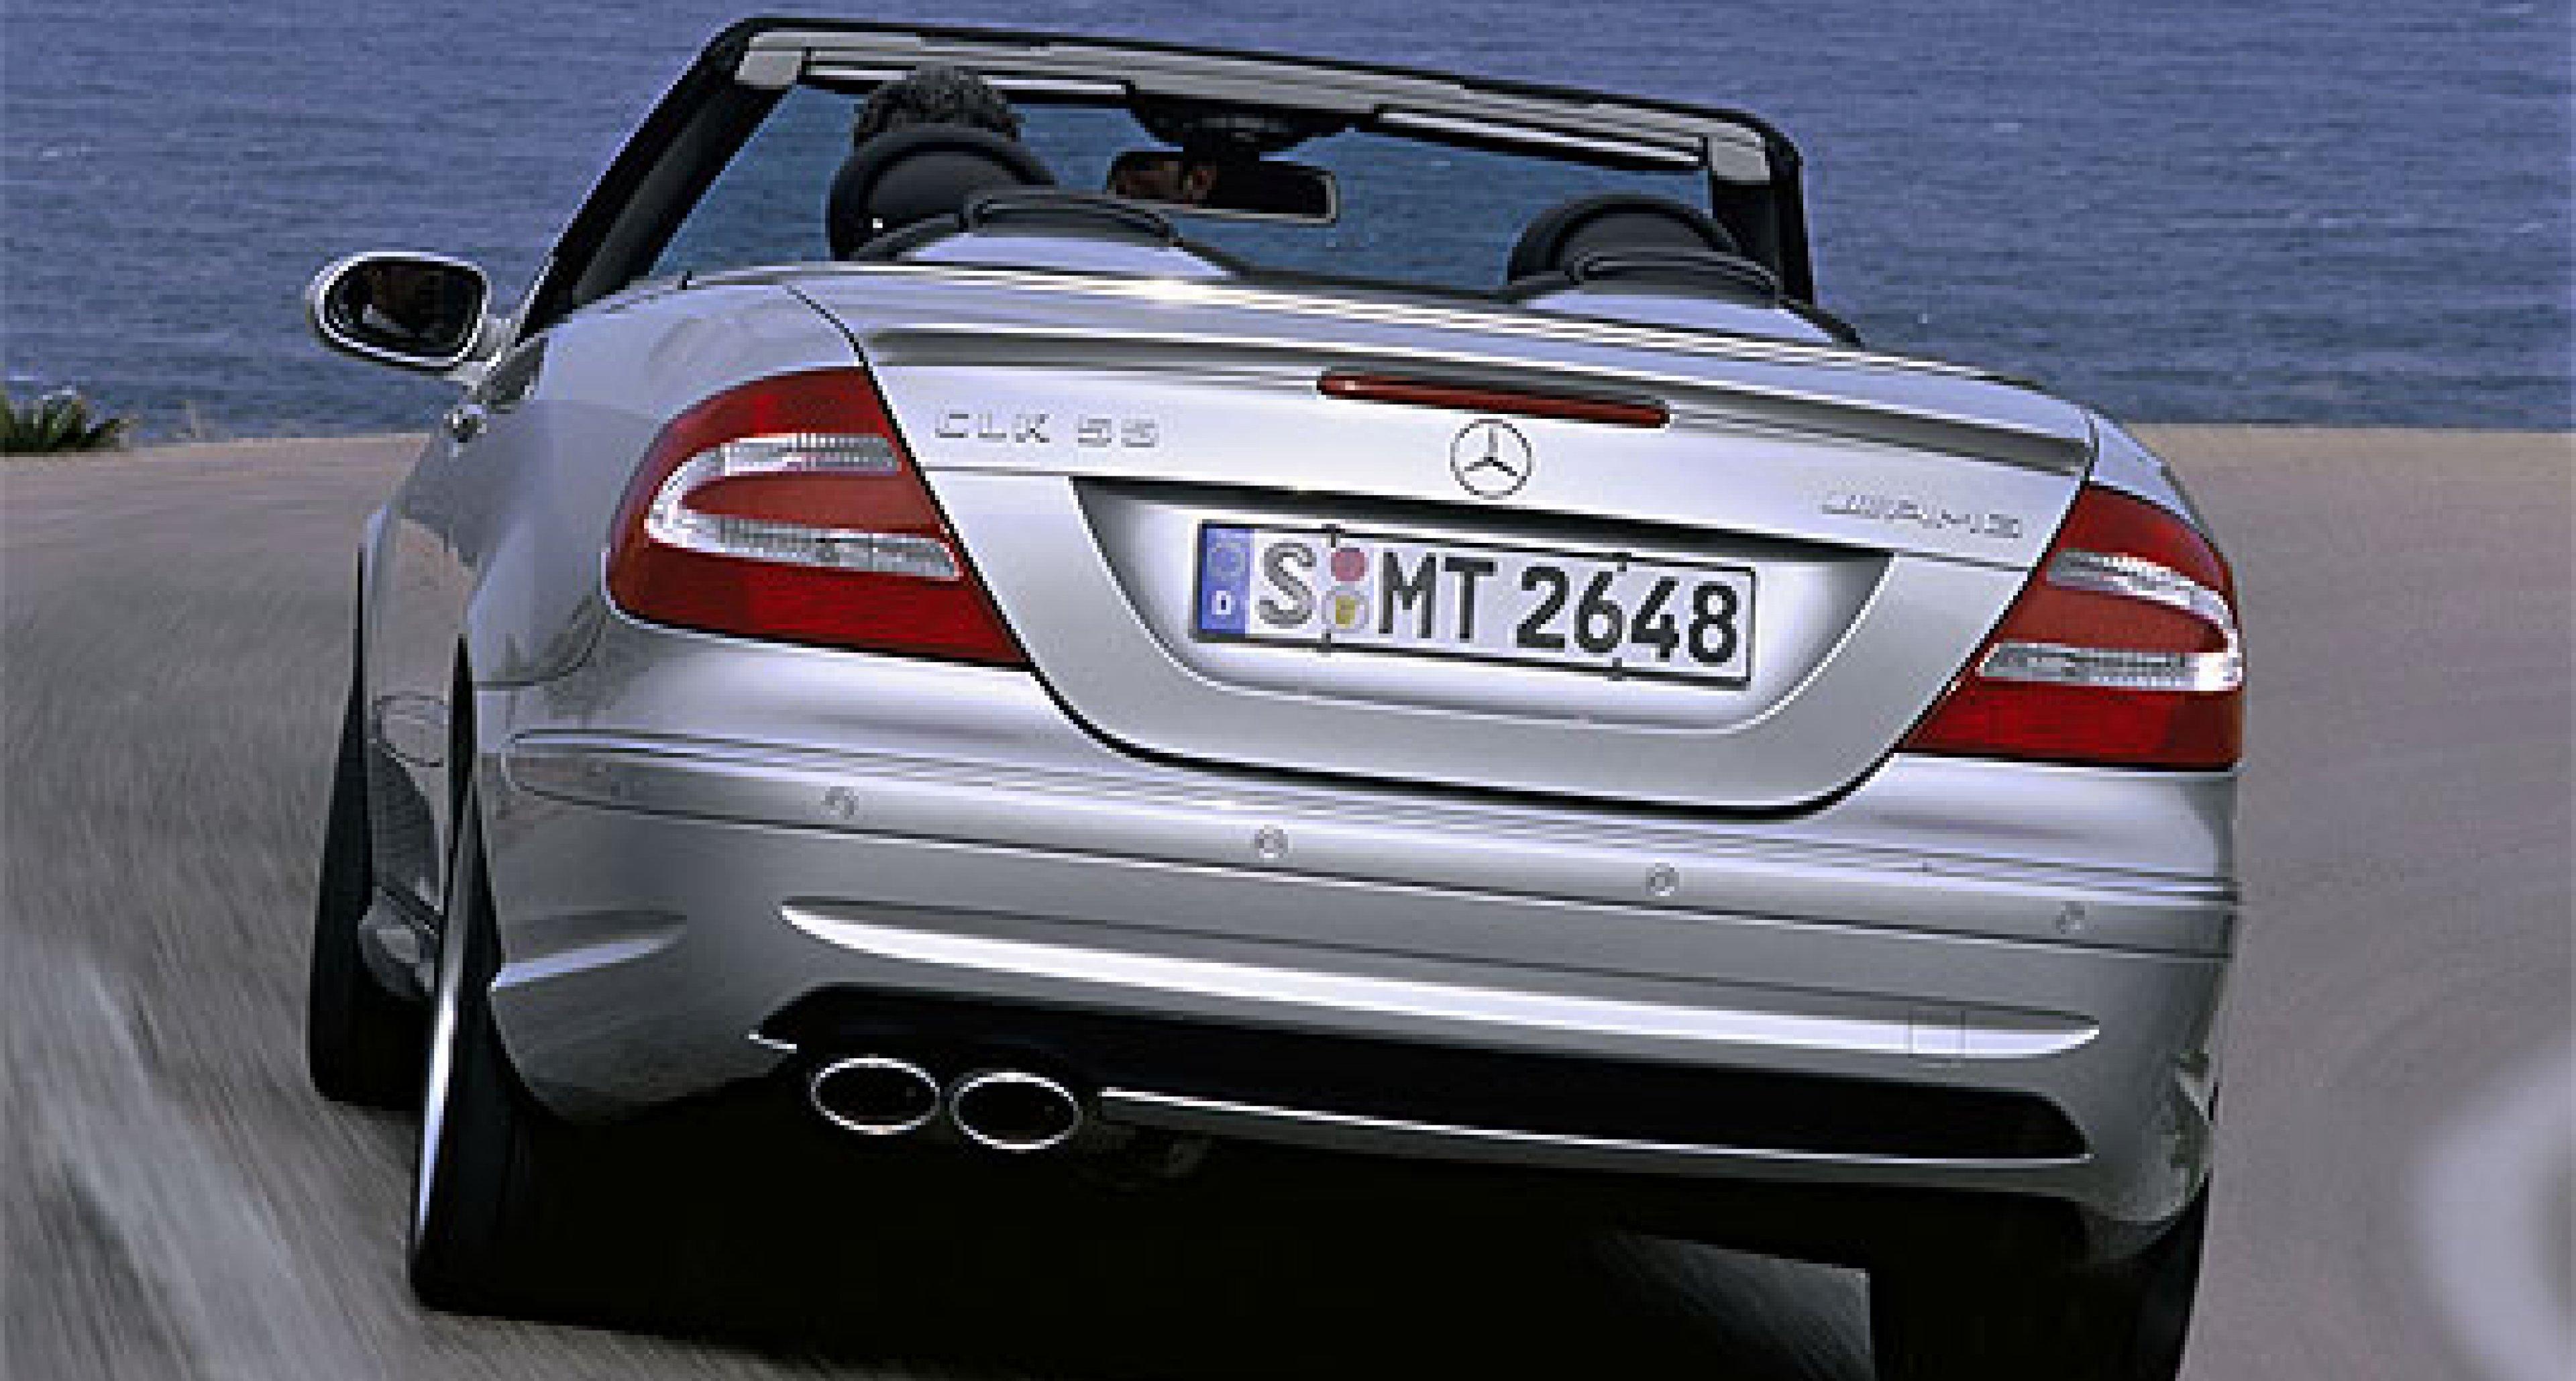 Mercedes-Benz CLK 55 AMG Cabriolet